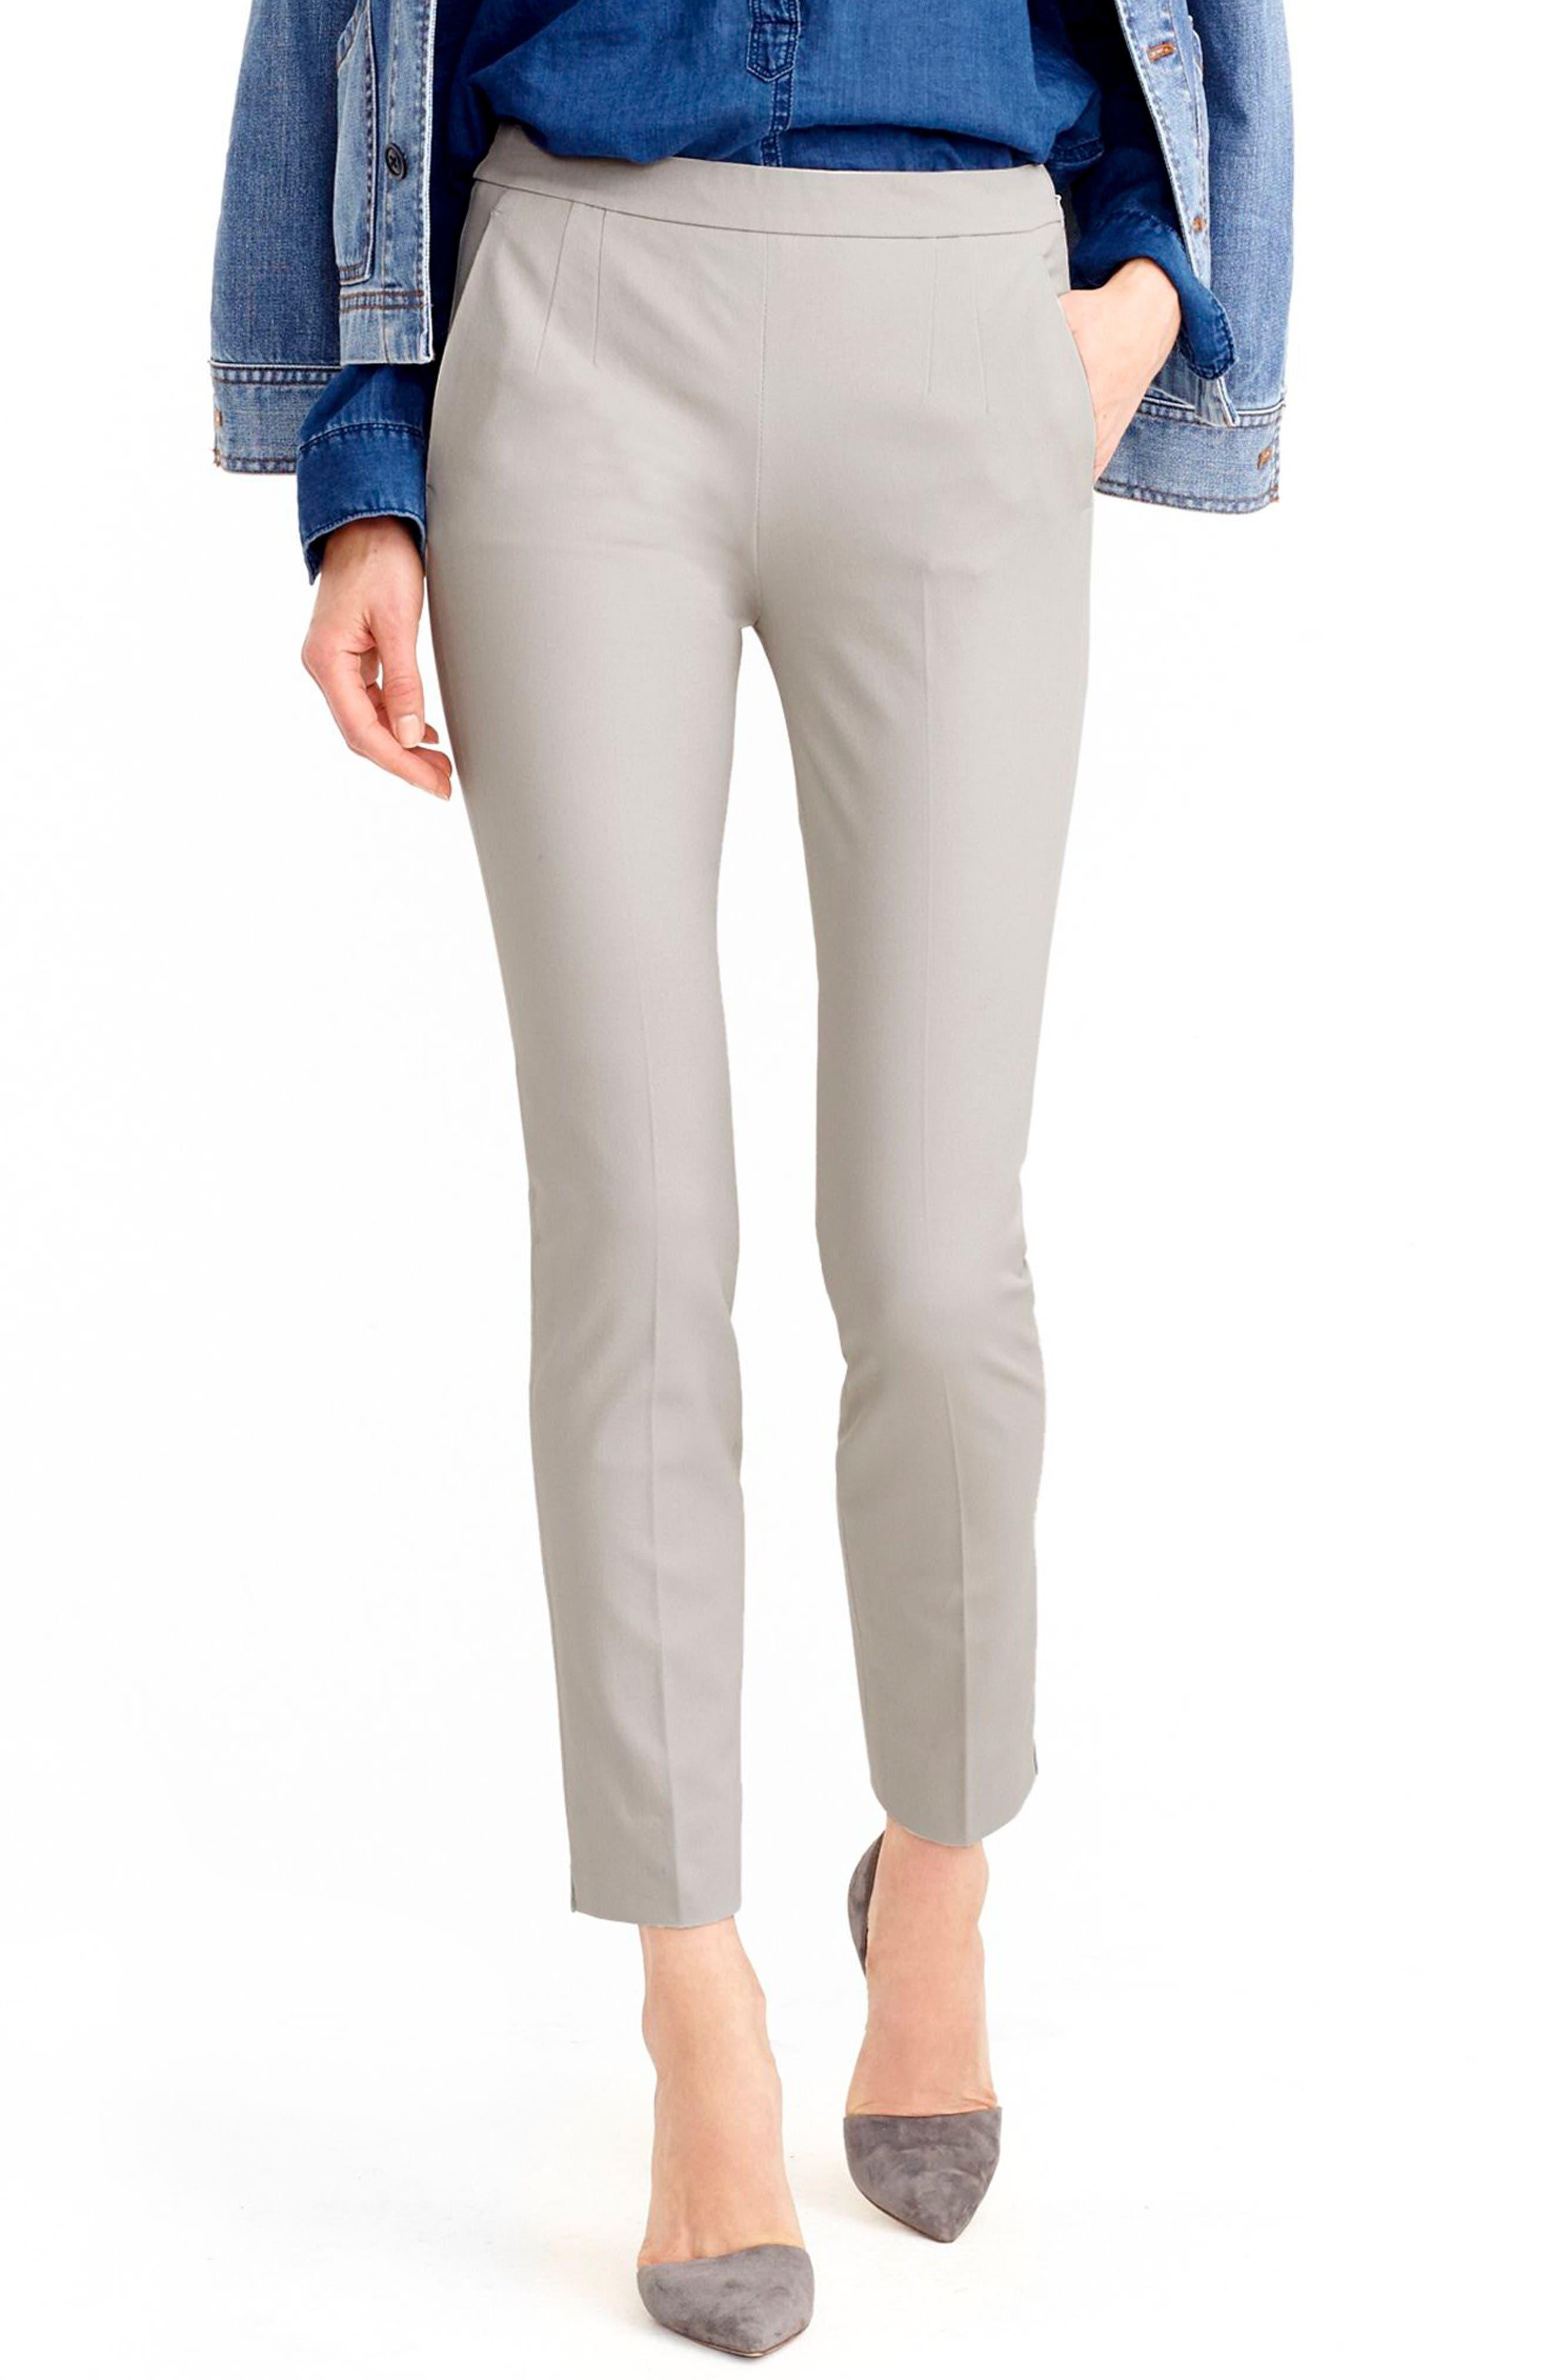 J.Crew 'Martie' Bi-Stretch Cotton Blend Pants (Regular & Petite